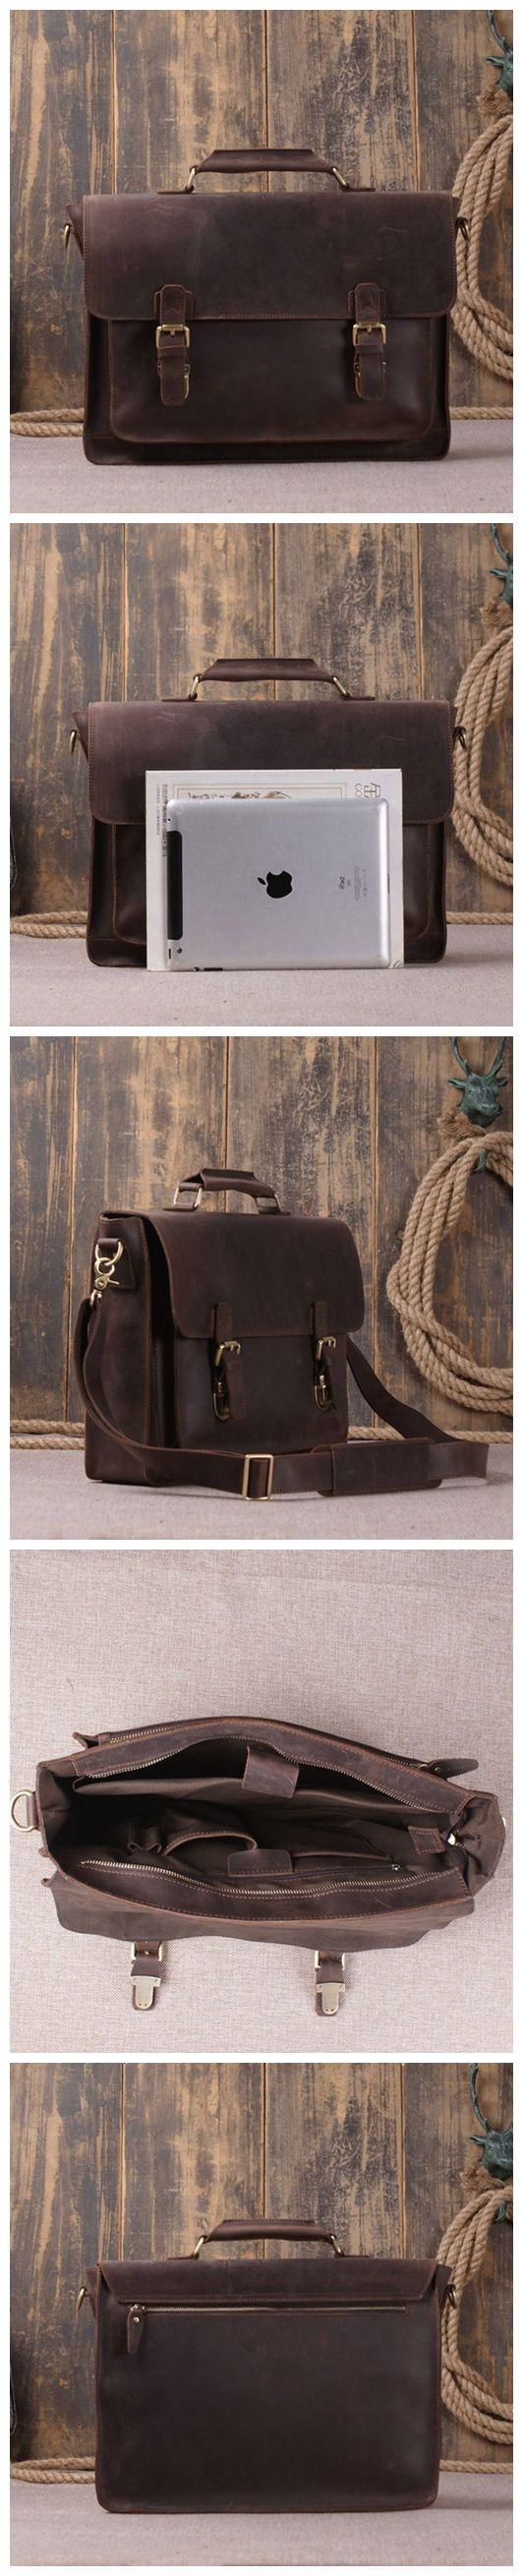 Vintage Style Genuine Leather Laptop Messenger Bag Leather Briefcase Men's Fashion Bag